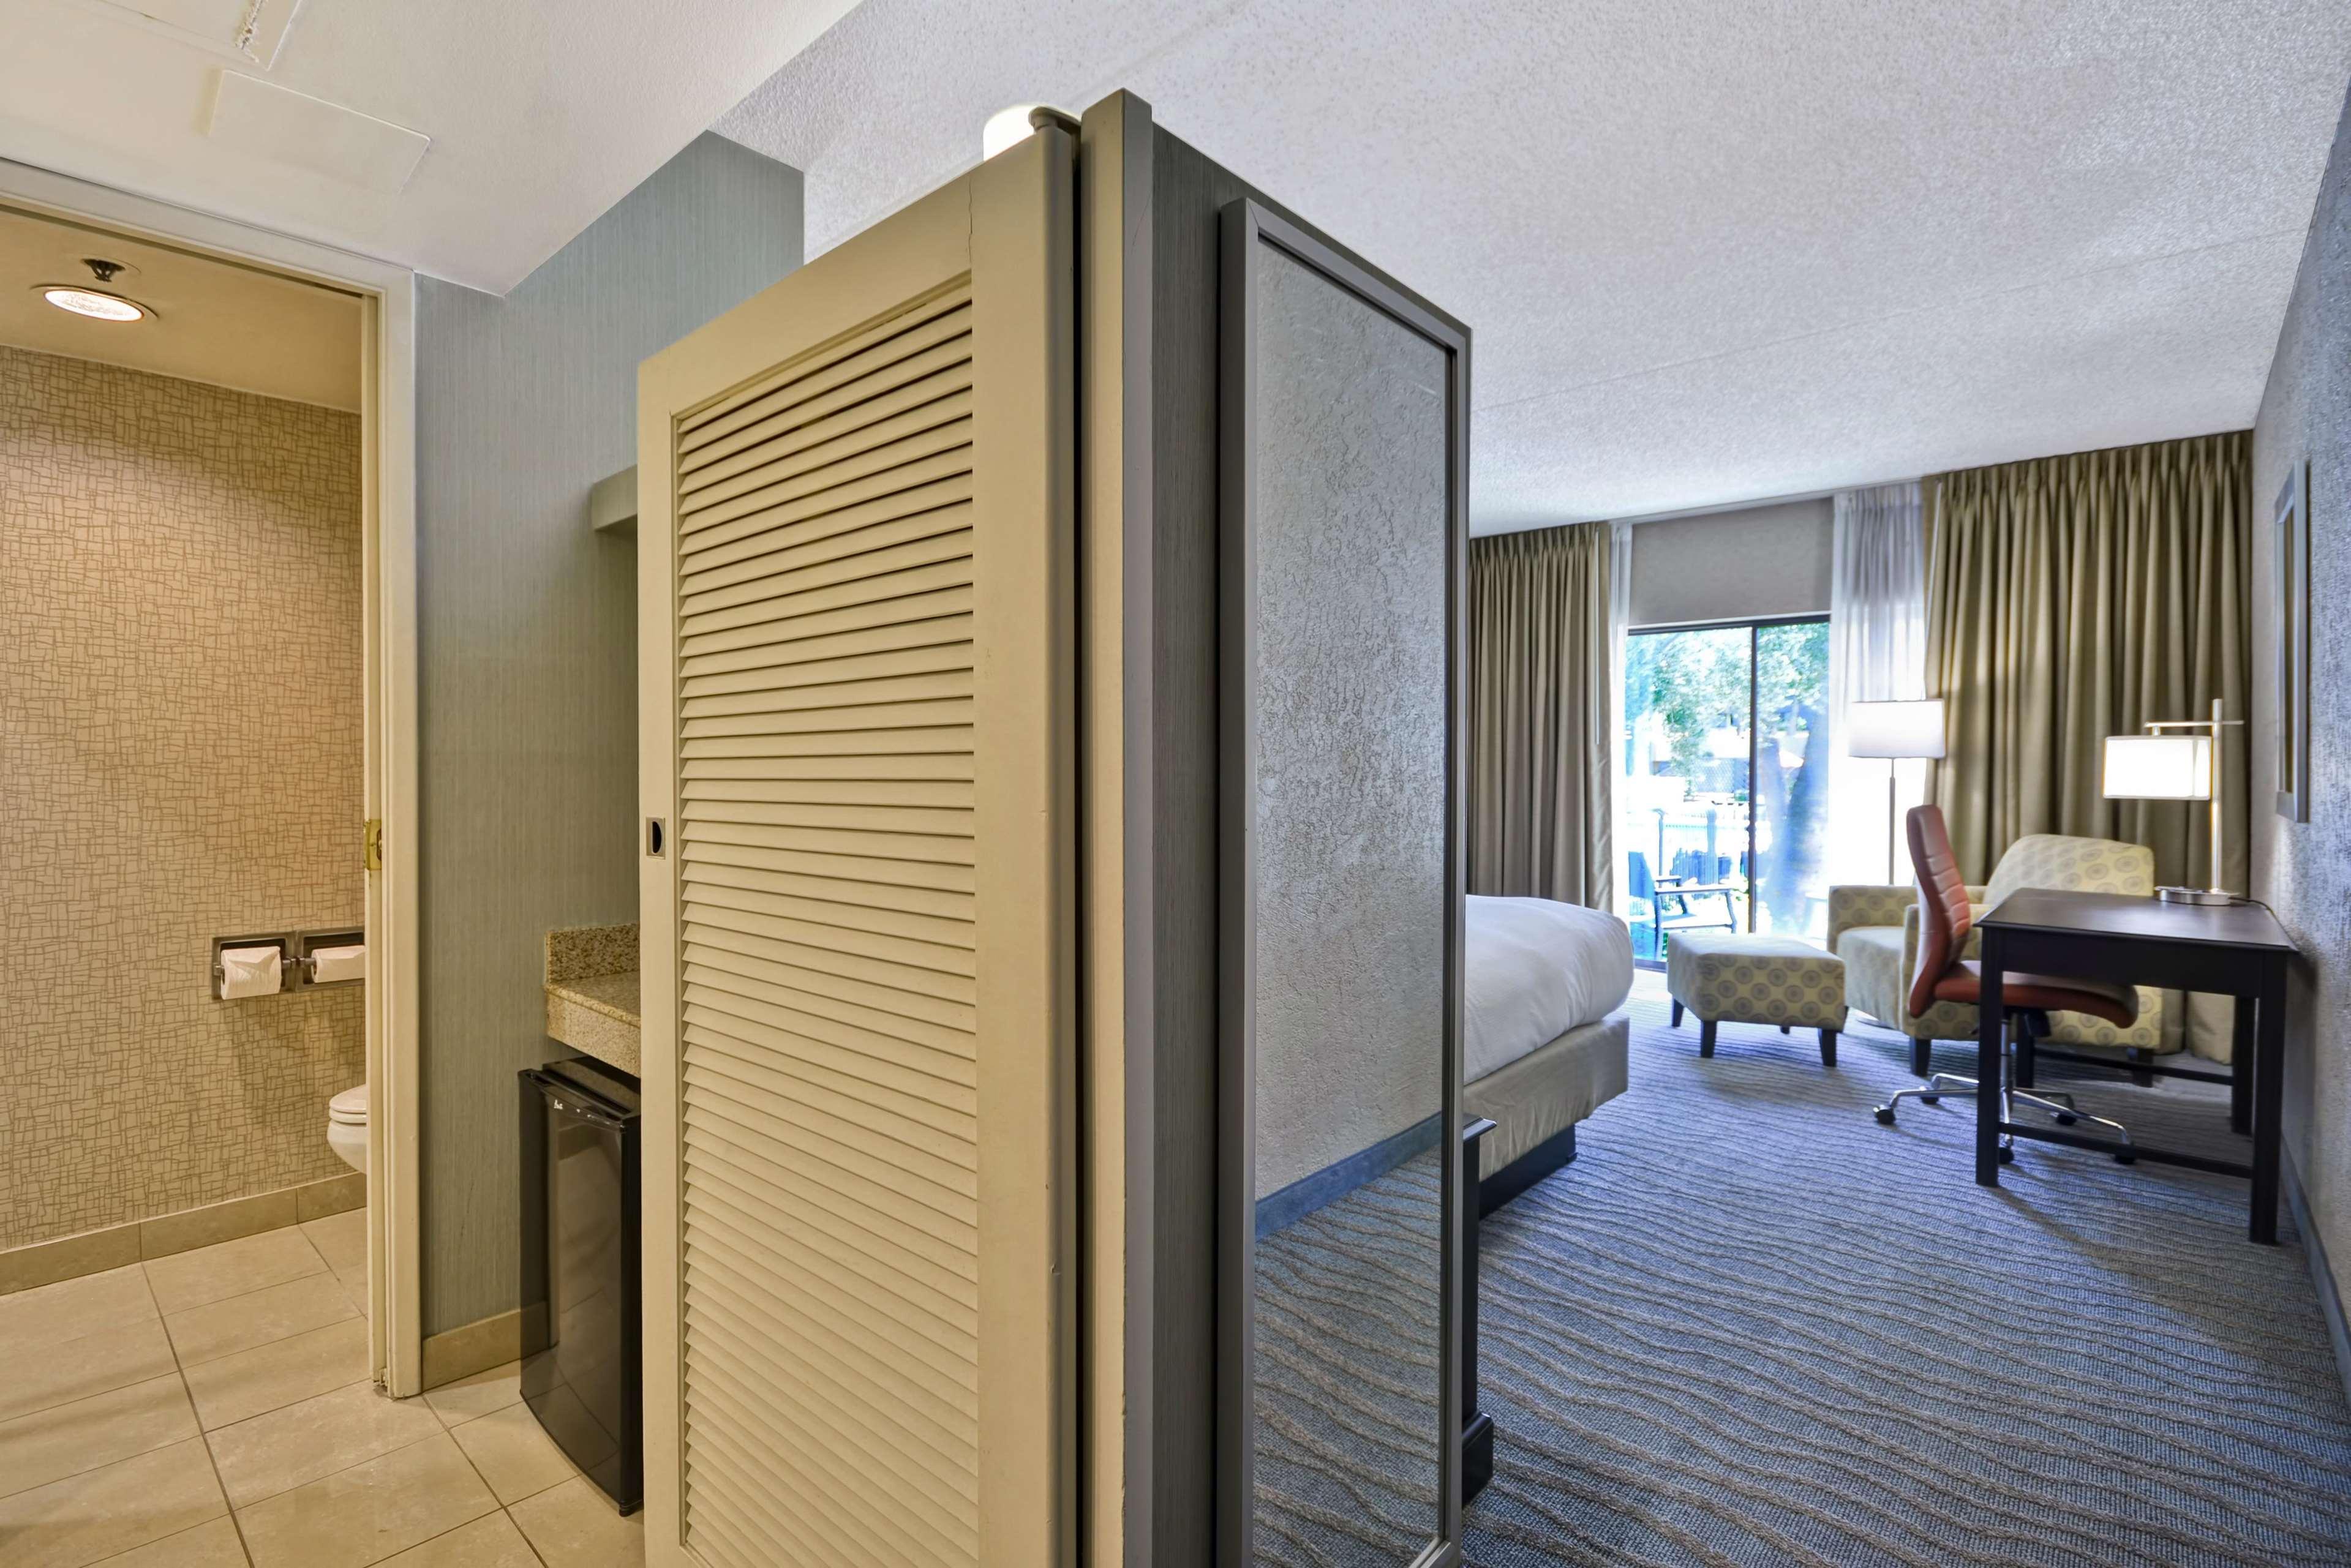 DoubleTree by Hilton Phoenix North image 20